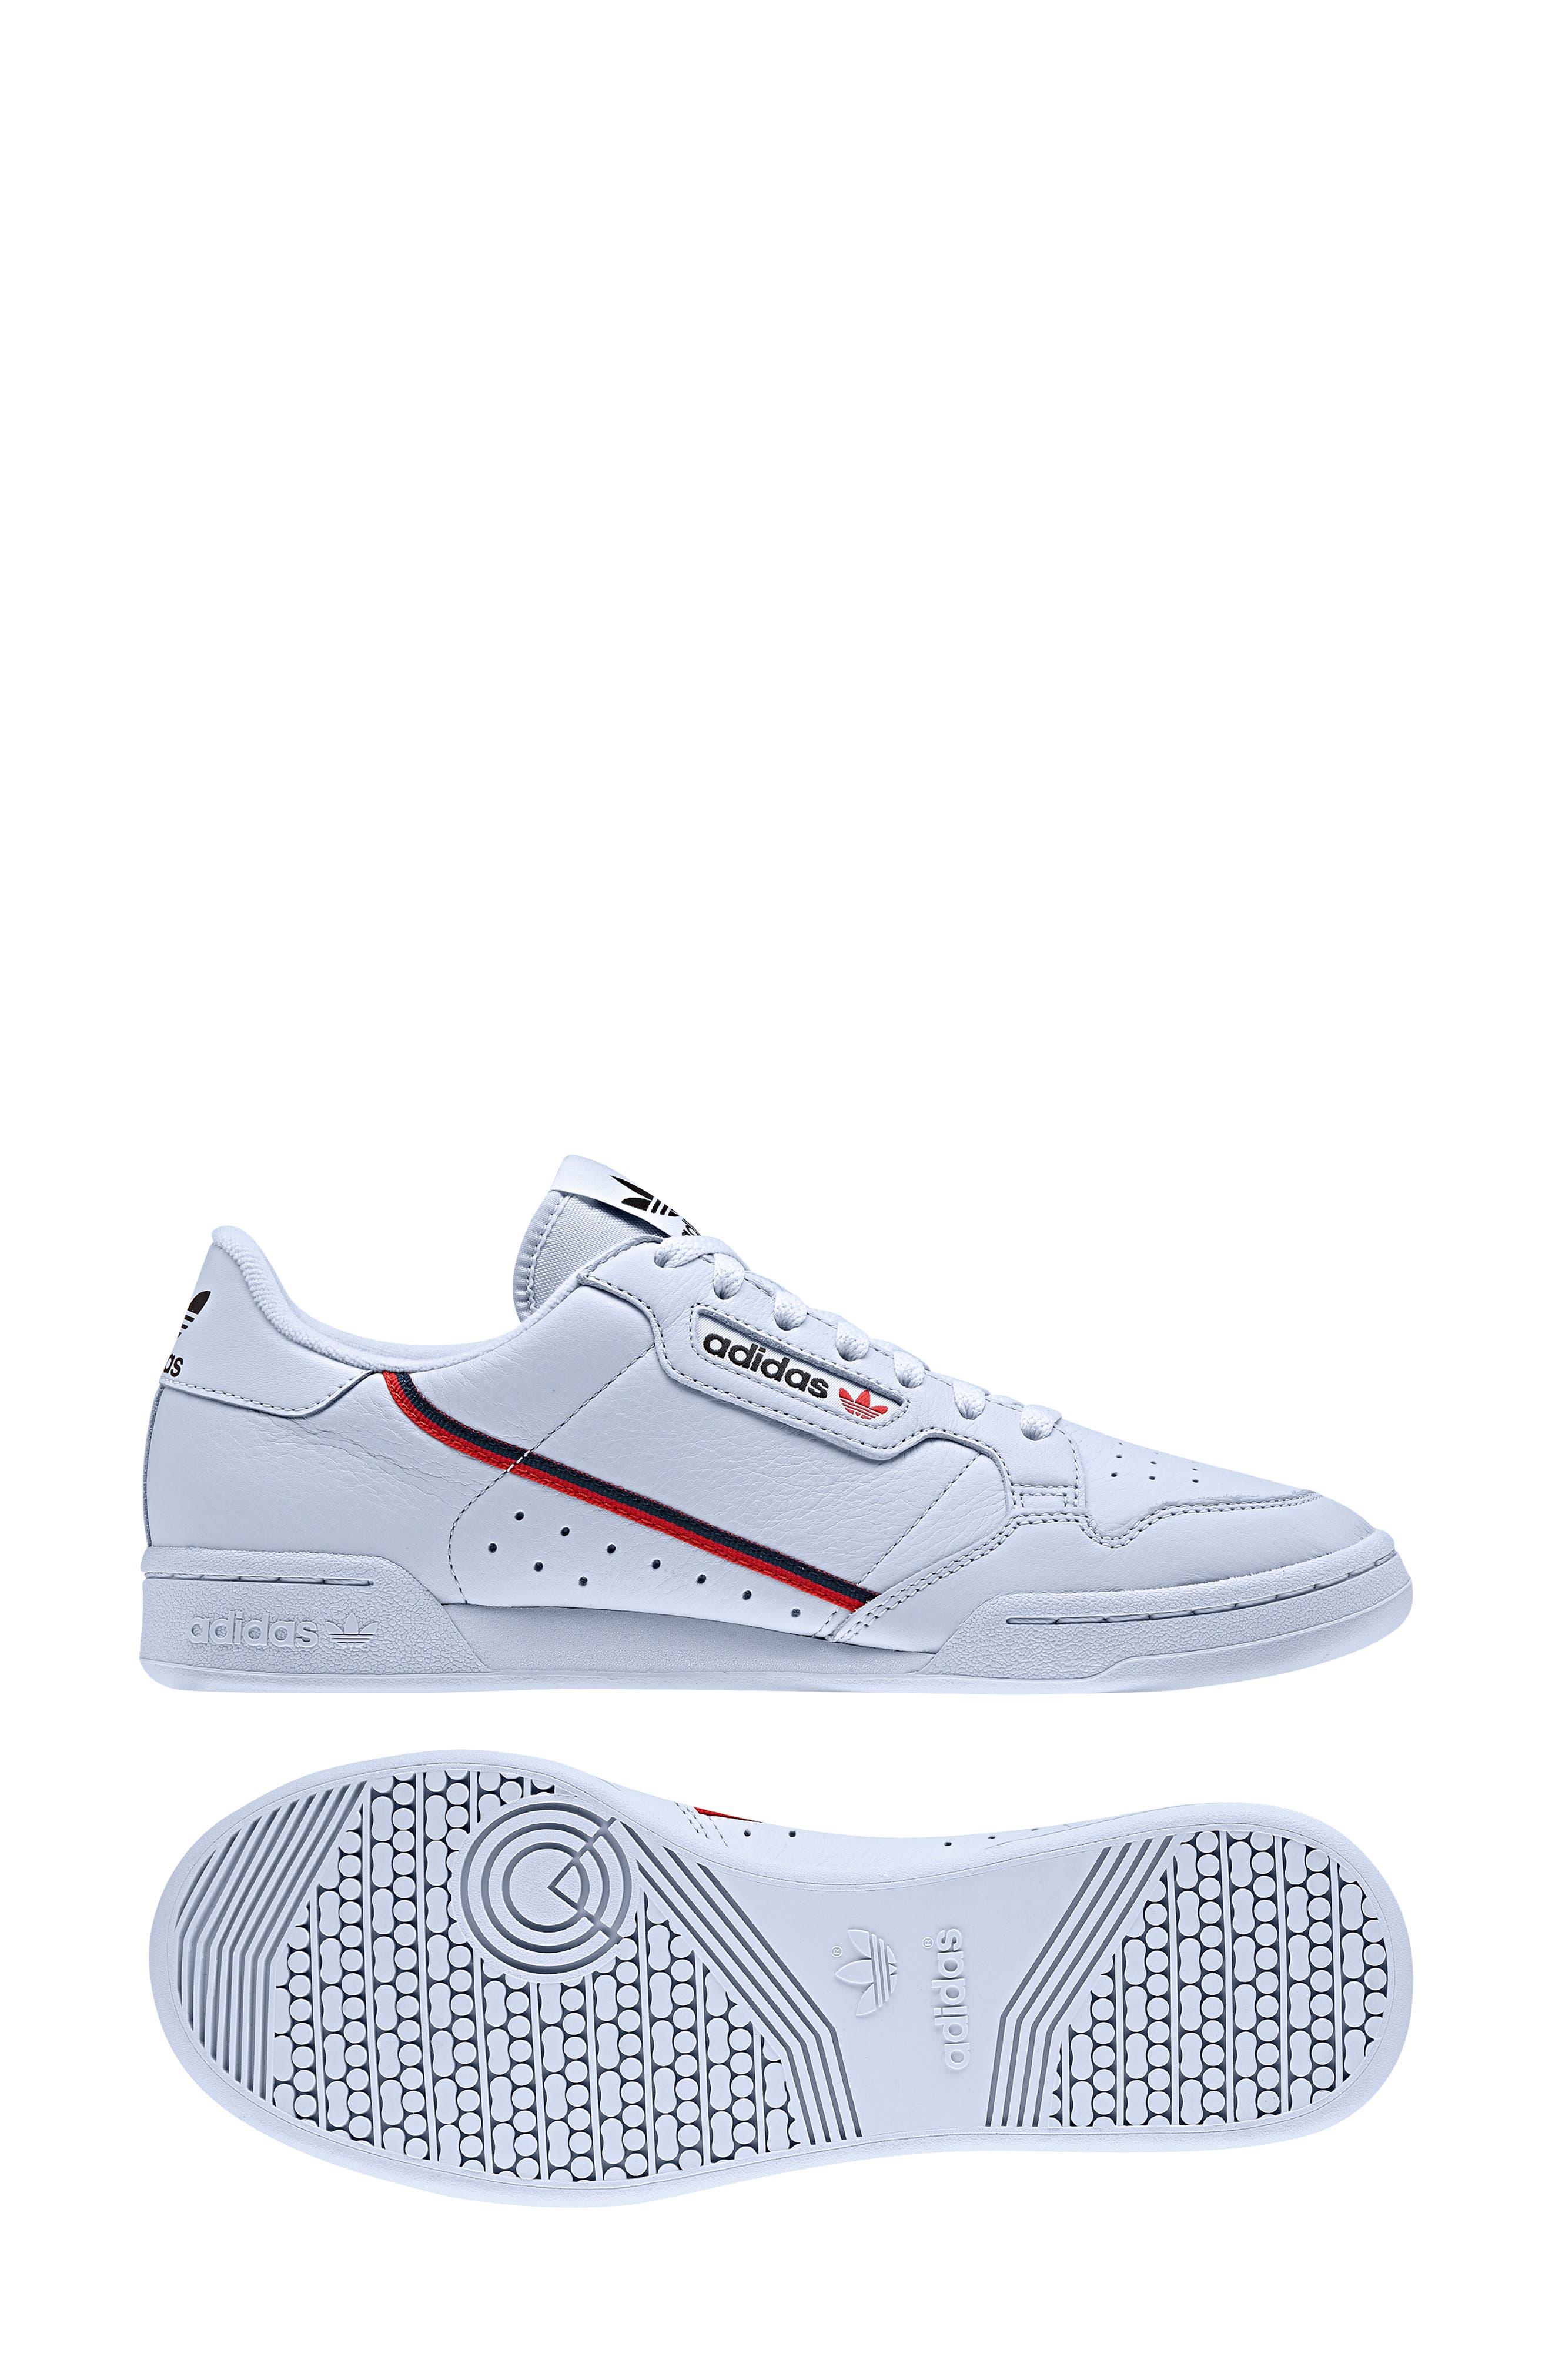 Continental 80 Sneaker,                             Alternate thumbnail 9, color,                             AERO BLUE/ SCARLET/ NAVY